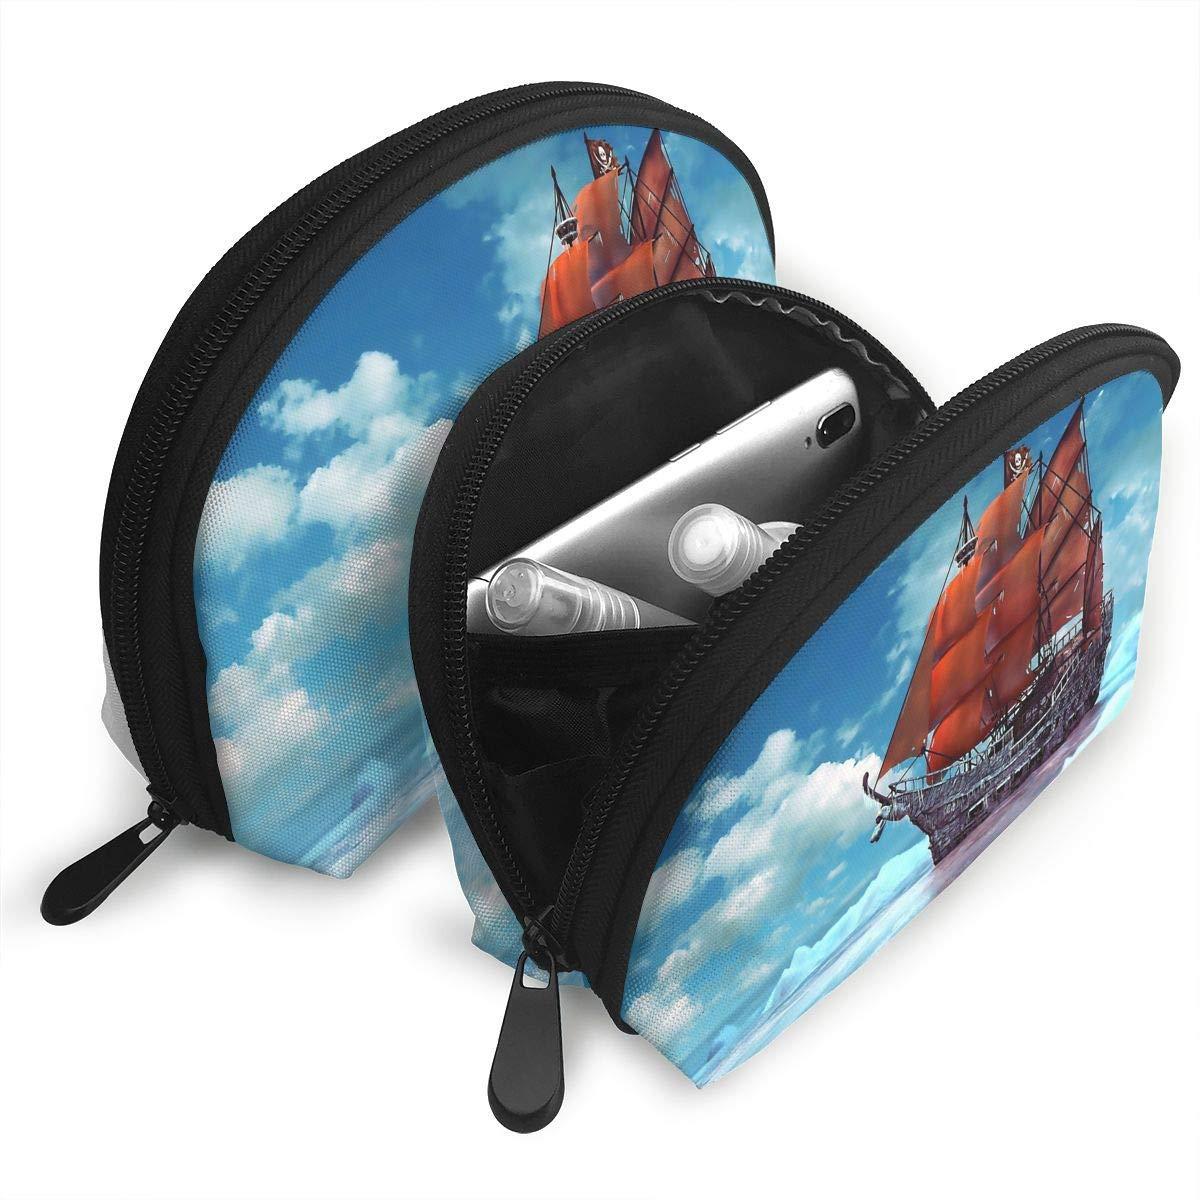 981526513884 Amazon.com : Pirate Ship Ice Snow Boat Ocean Sea Fantasy Shell ...